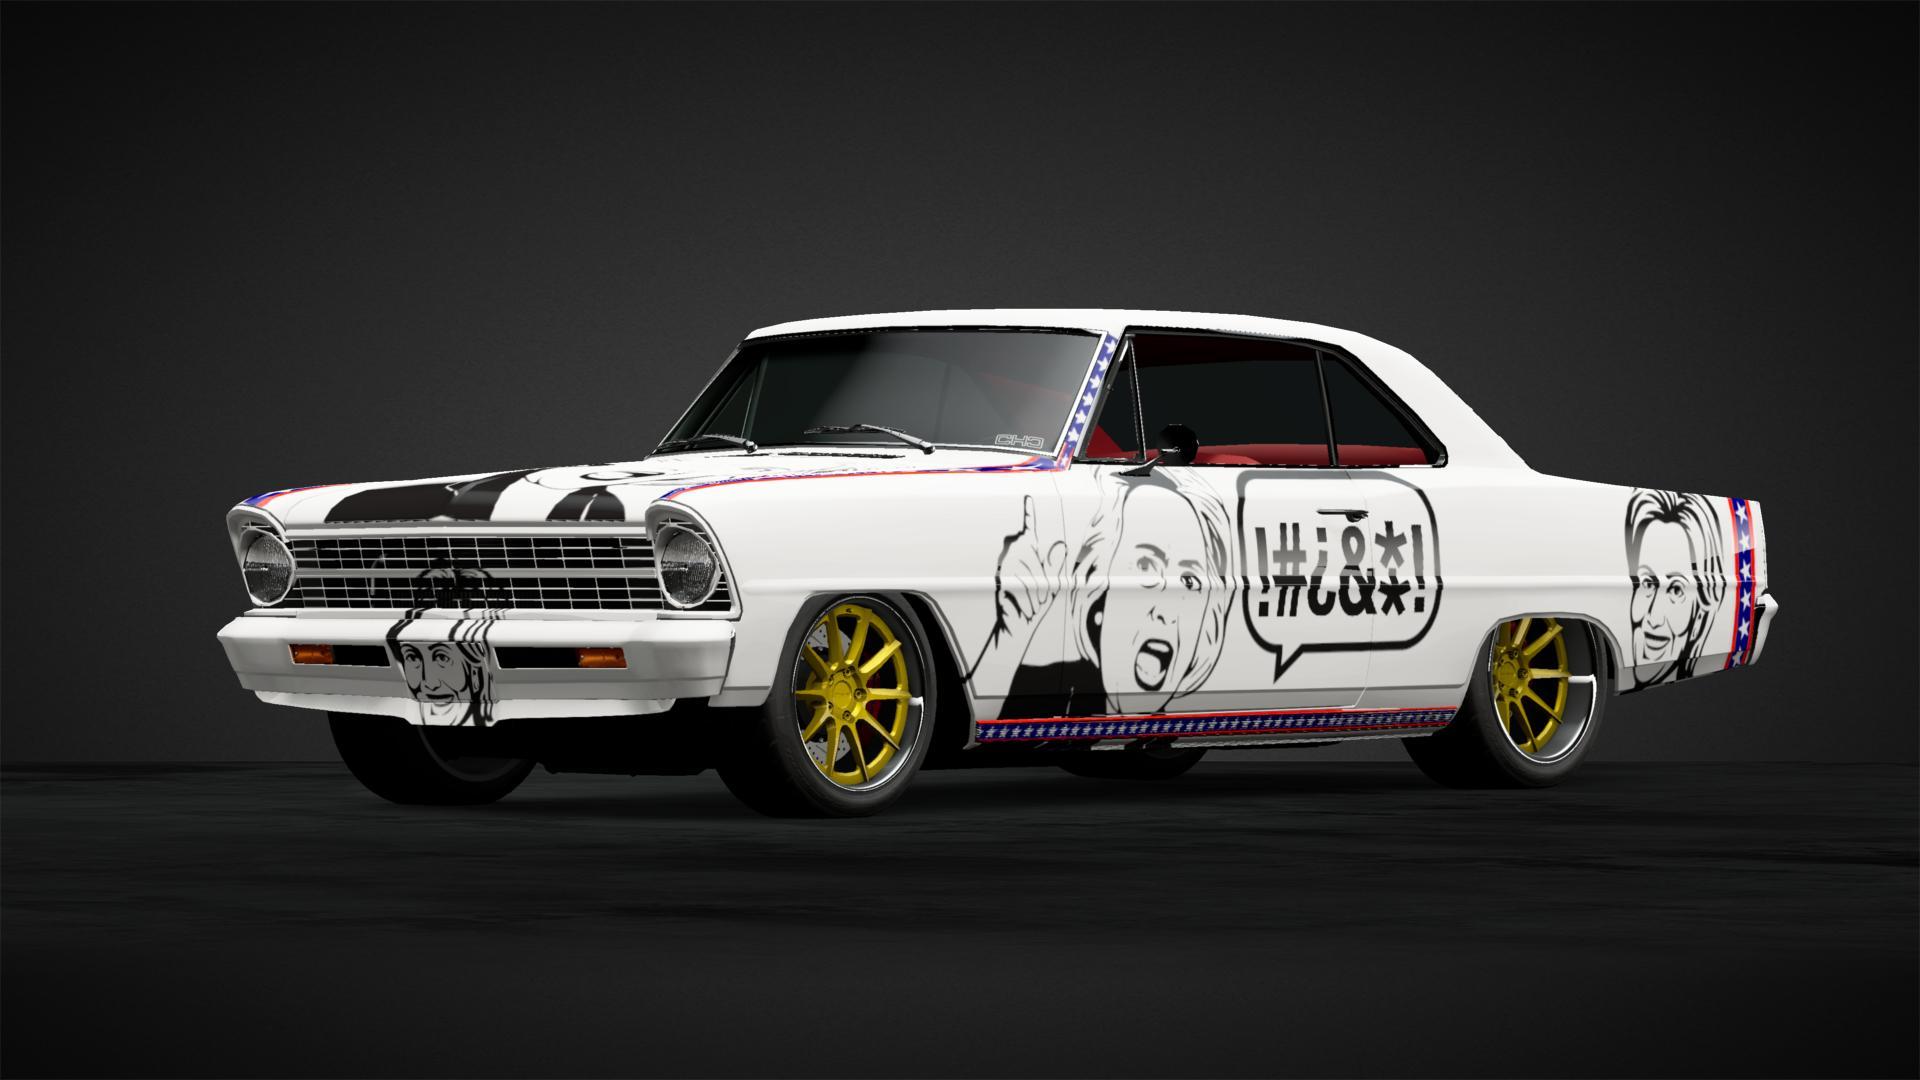 Hillary request car - Car Livery by kramenboer | Community